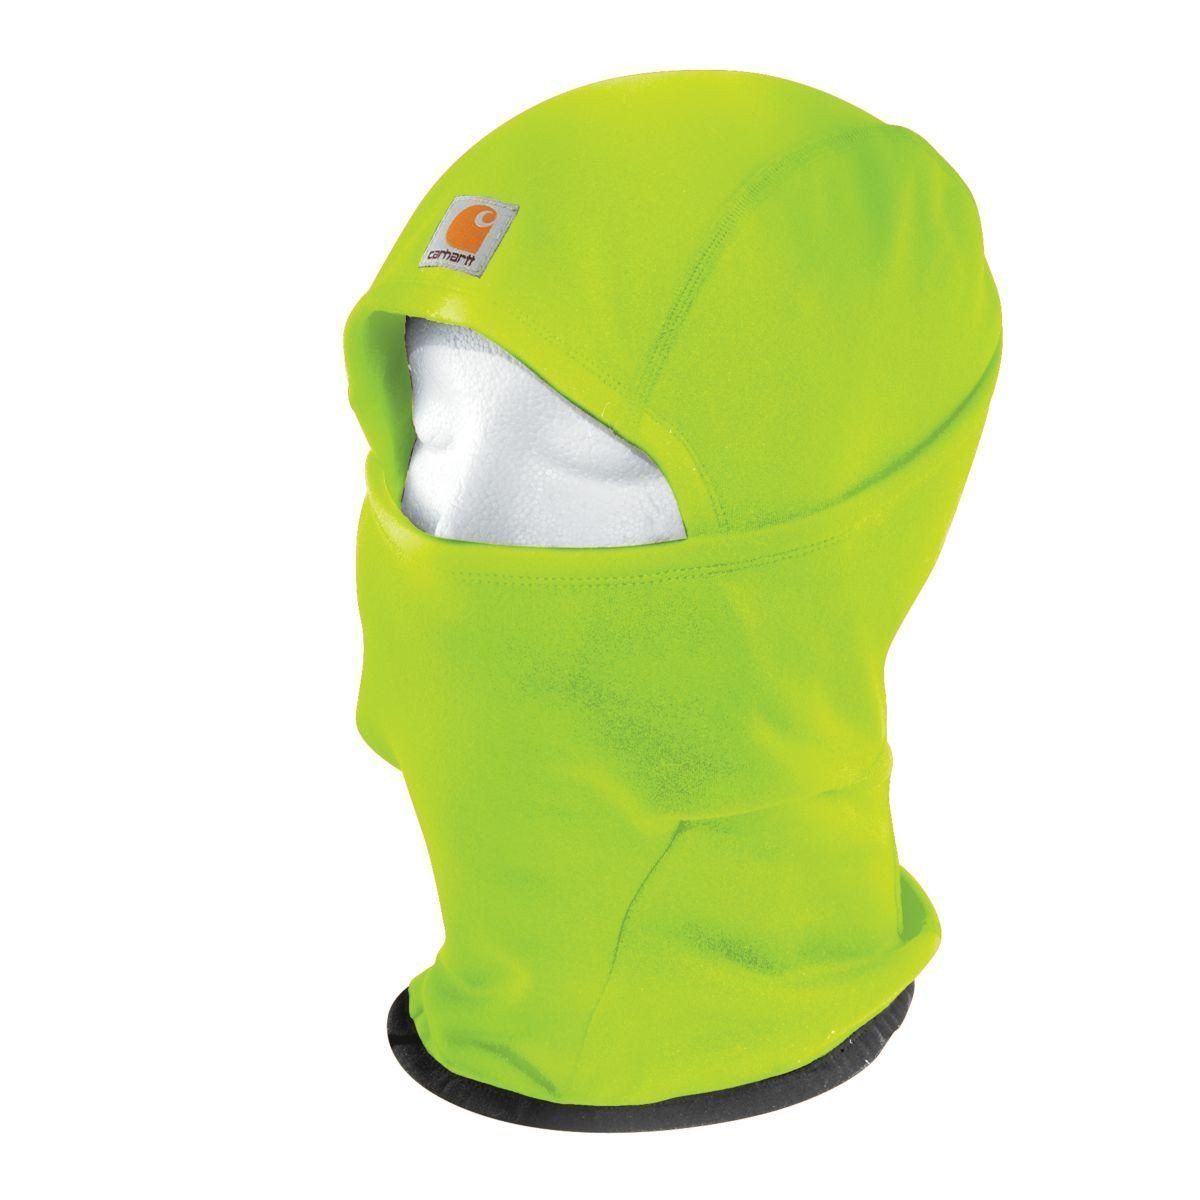 Carhartt Men\'s Brite Lime Force Helmet Liner Mask